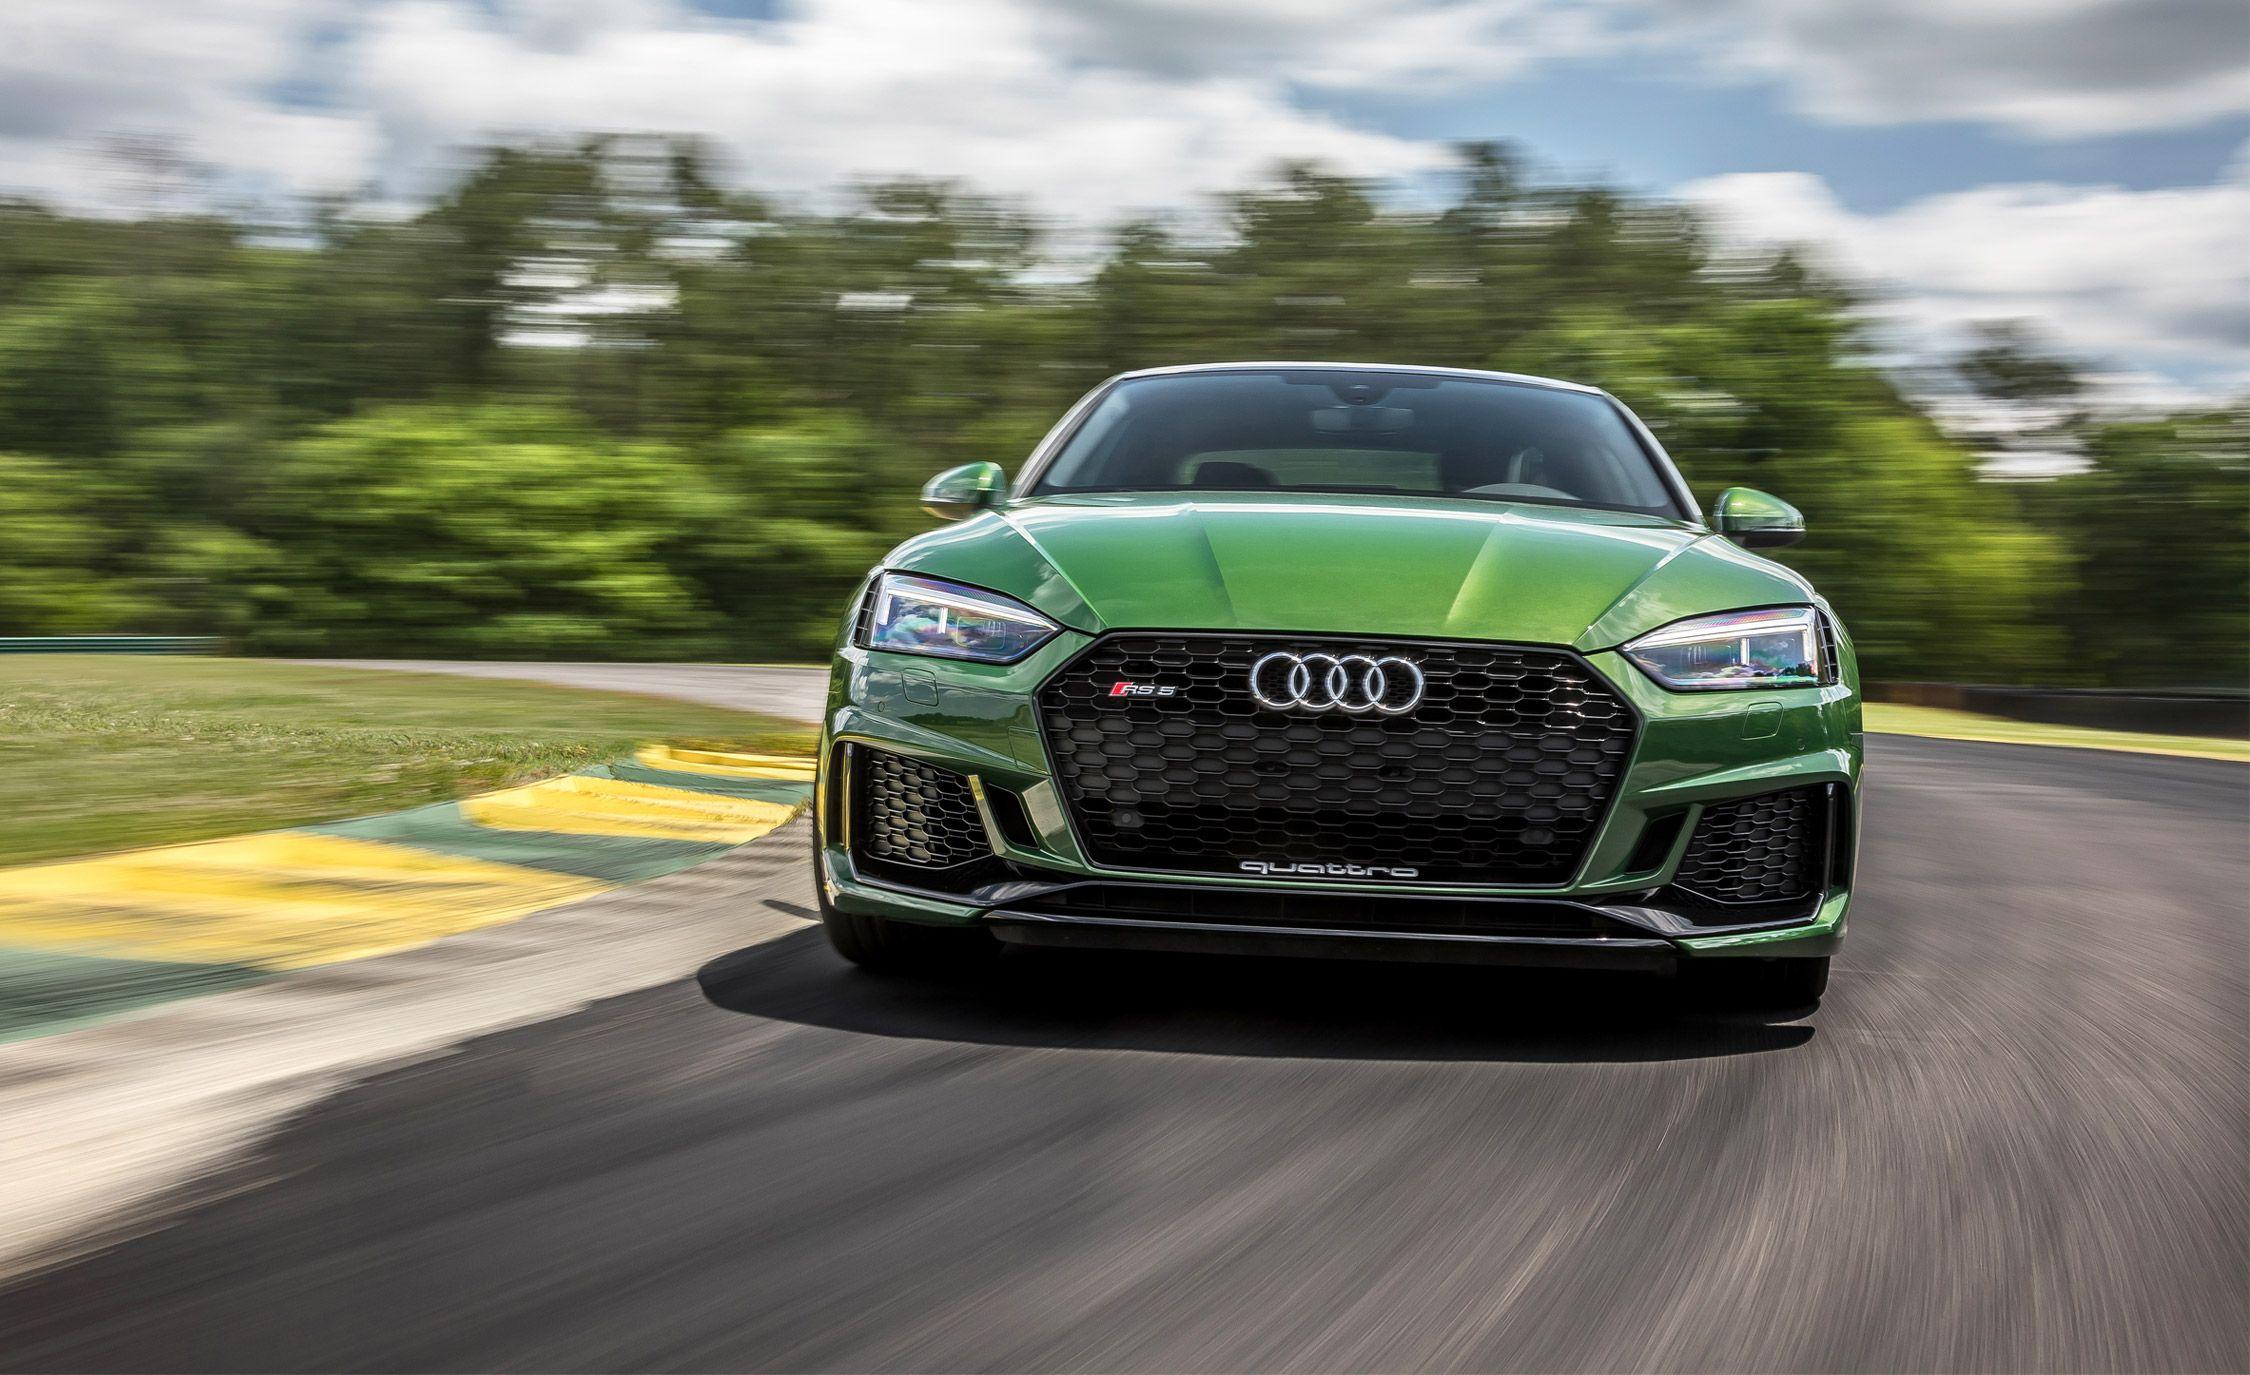 2018 Audi RS5 at Lightning Lap 2018